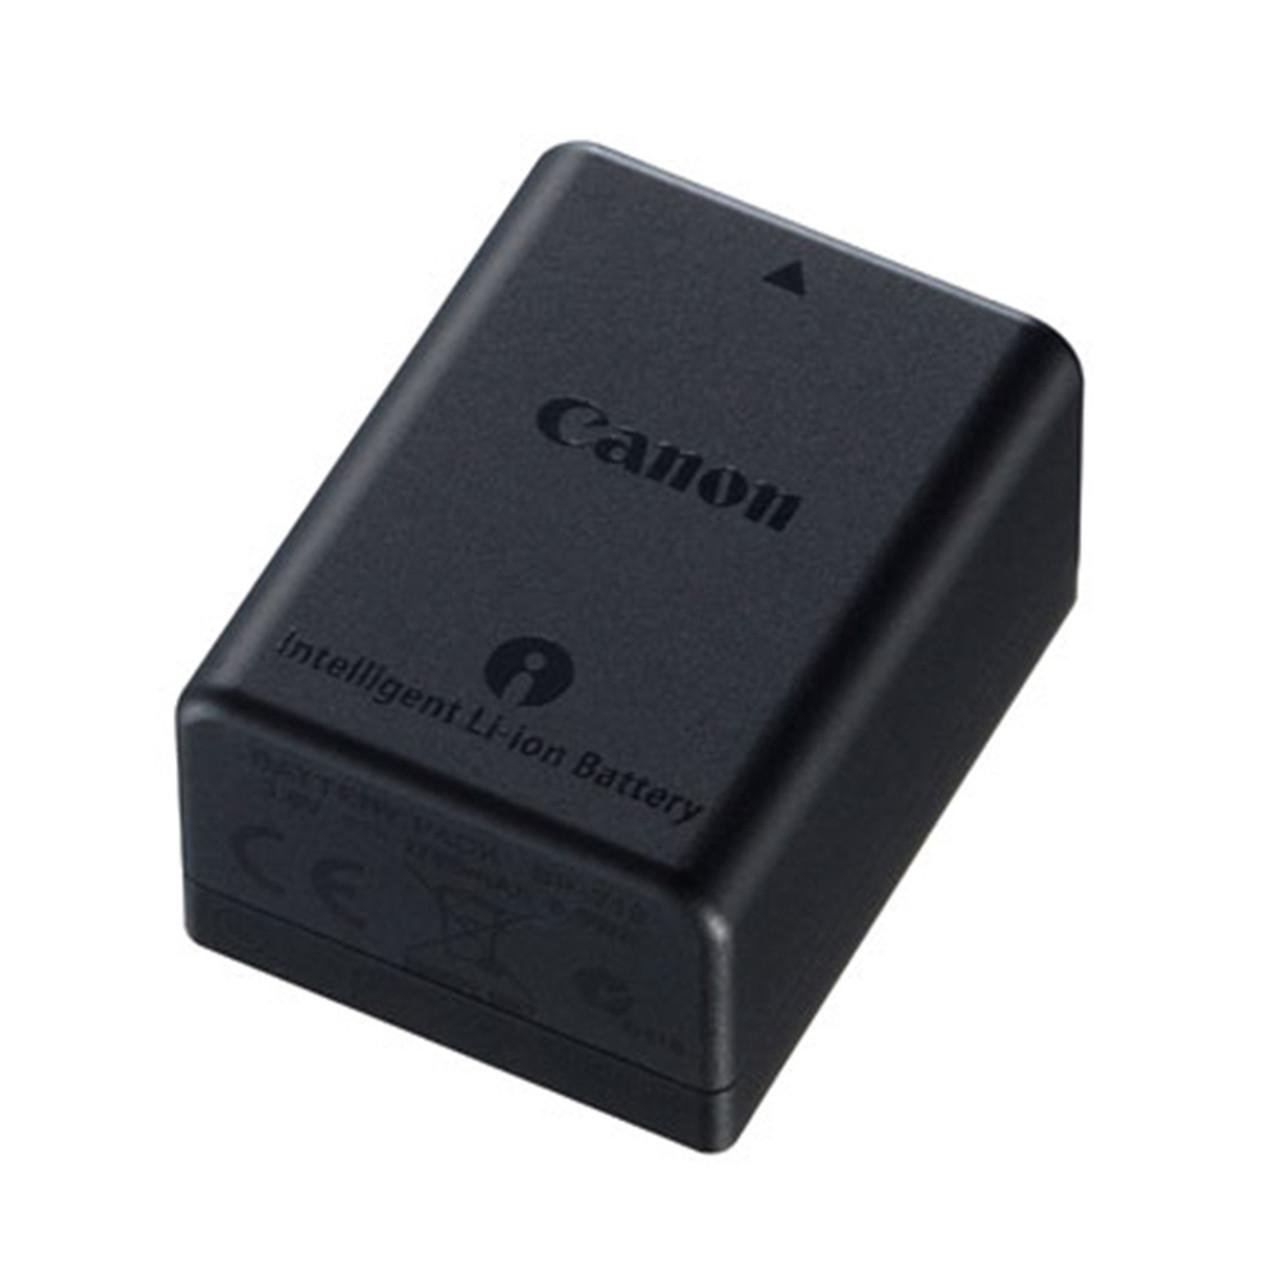 CANON BP-718 BATTERY PACK